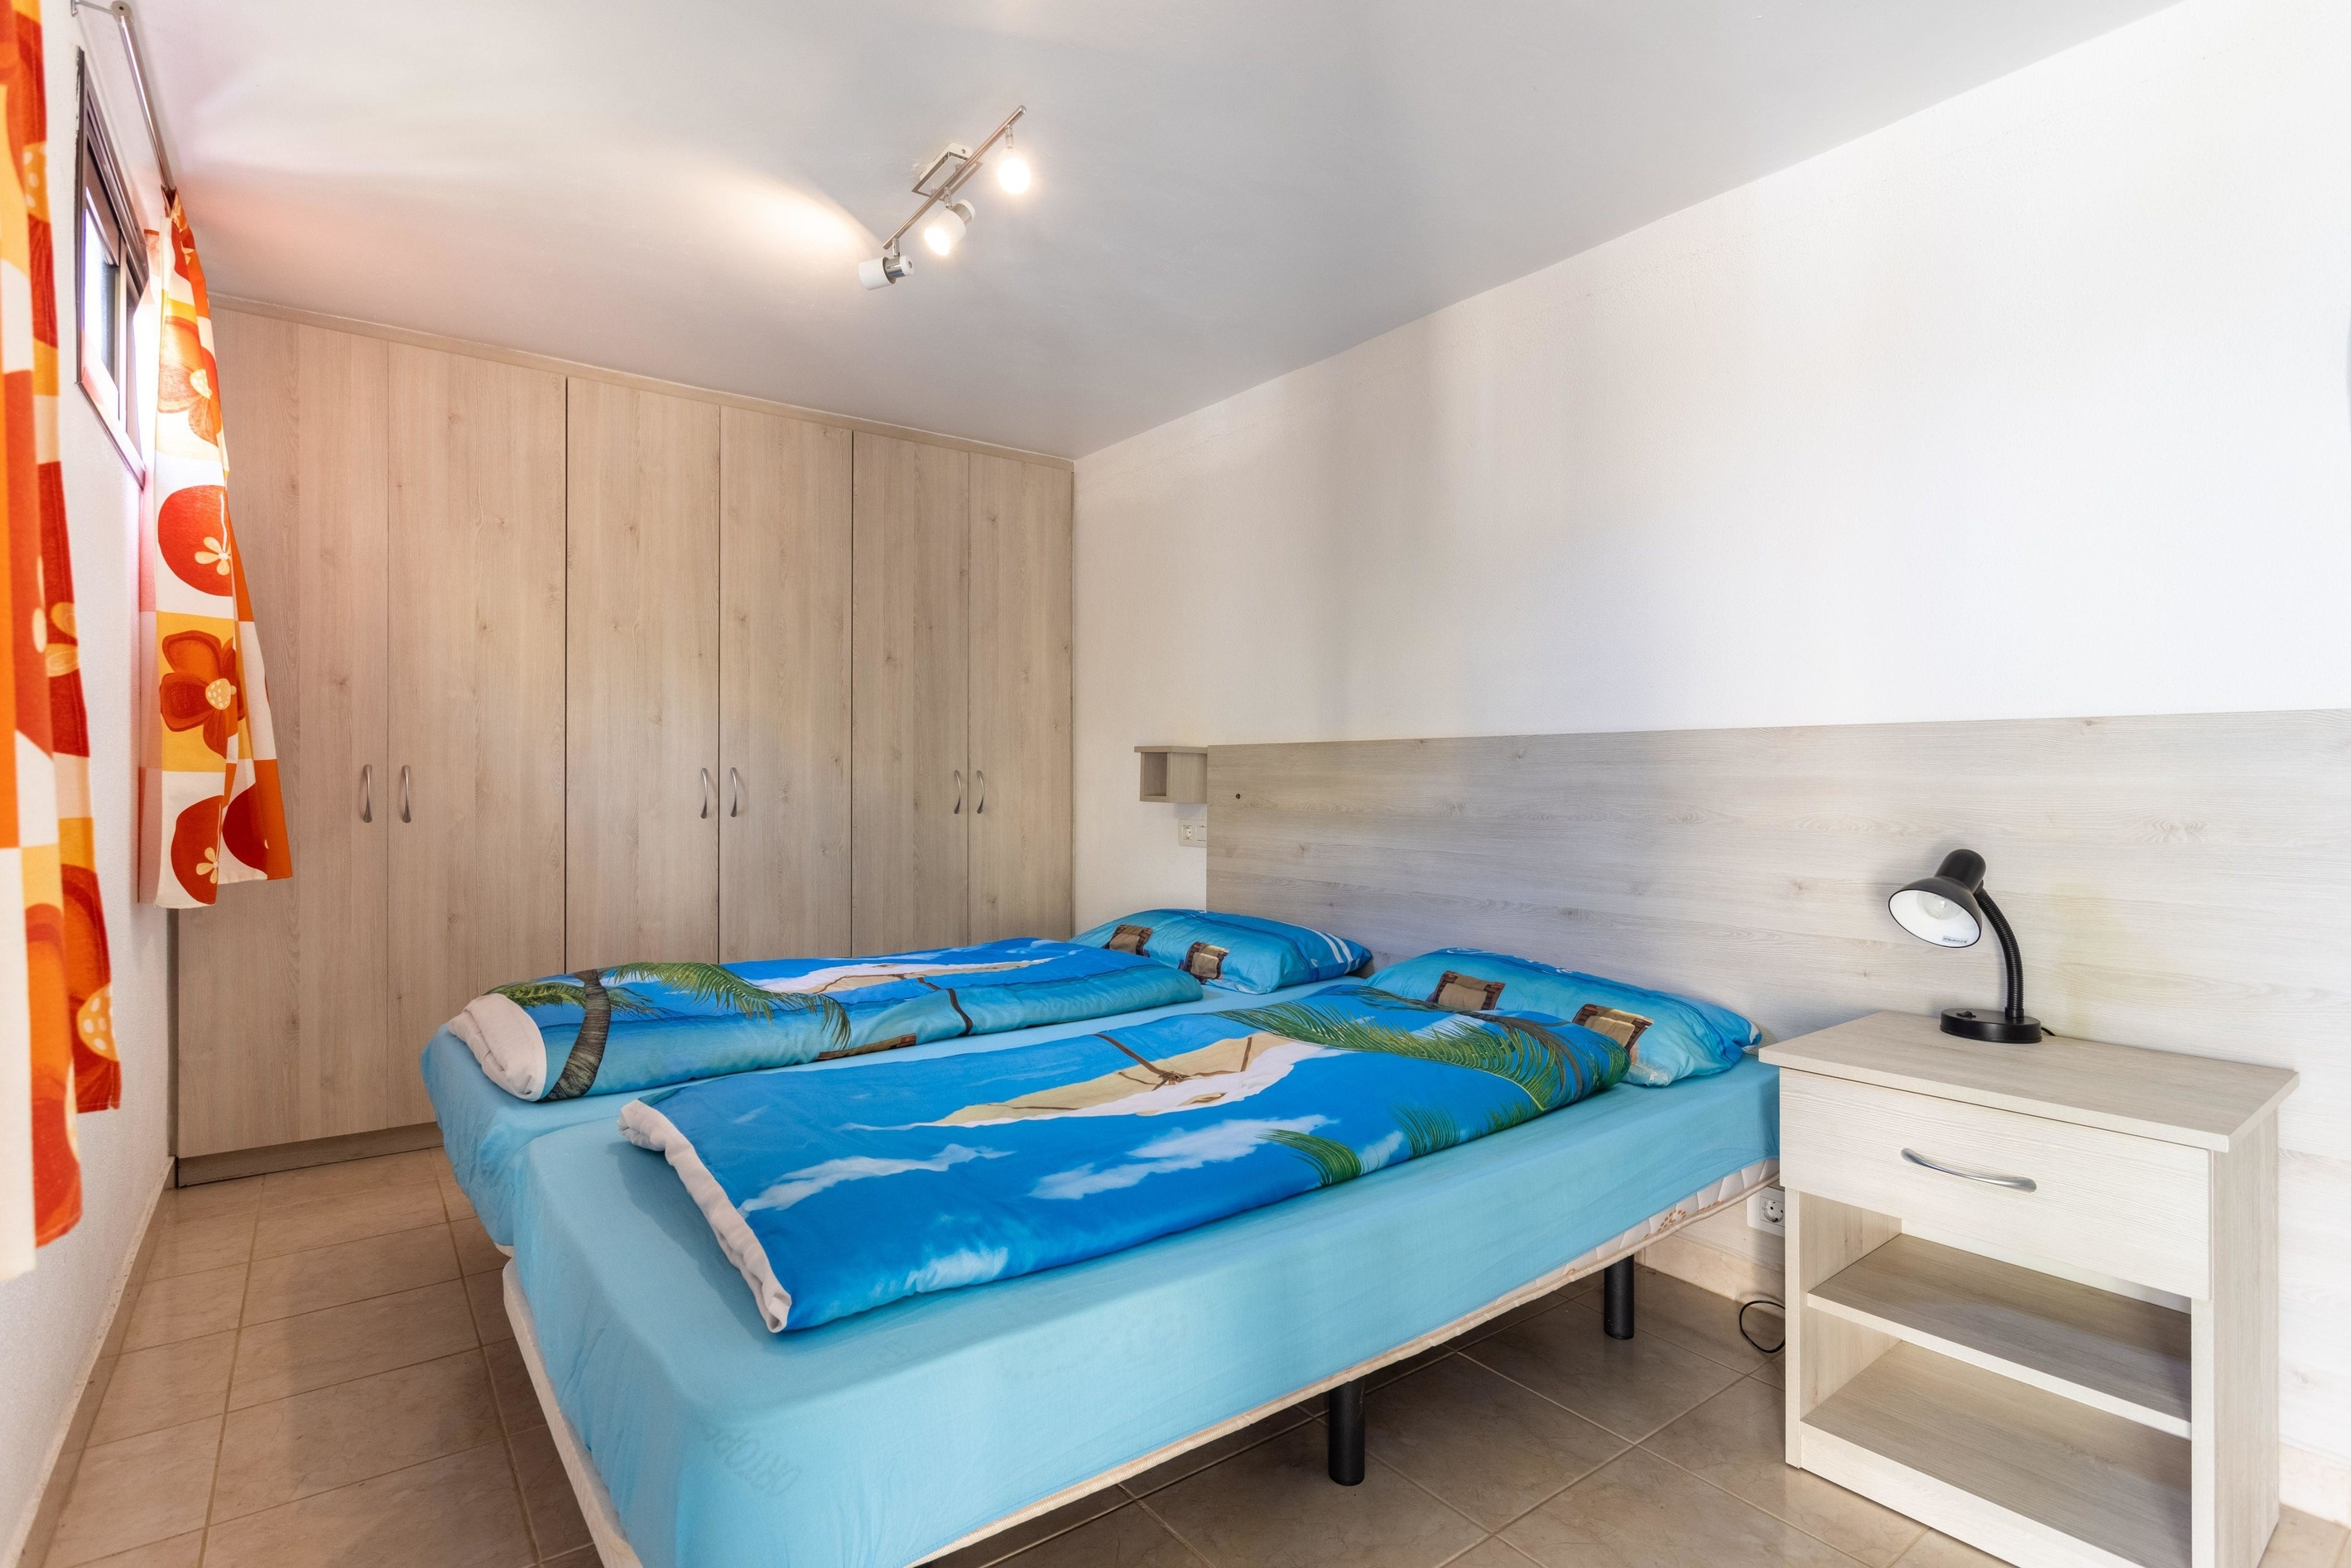 Appartement de vacances Fewo Atico Marazul, mit  Panorama- und Meerblick, Pool, Terrasse, Grill, Parkplatz und WLA (2492979), Santa Ursula, Ténérife, Iles Canaries, Espagne, image 14